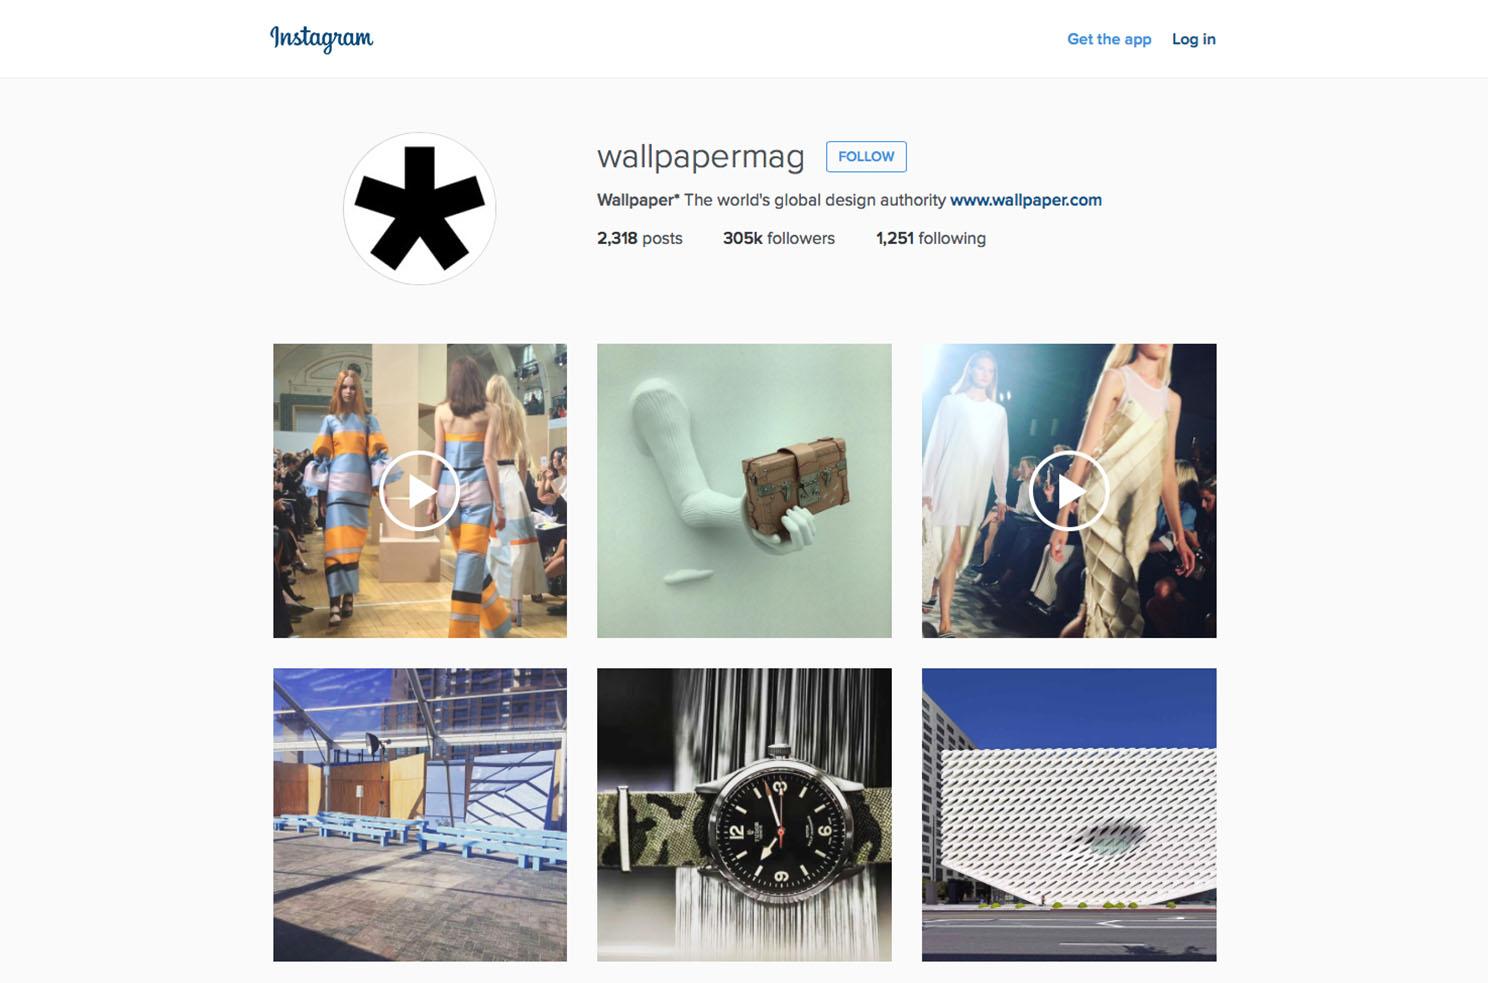 wallpapermag instagram Marvellous digital marketing agency